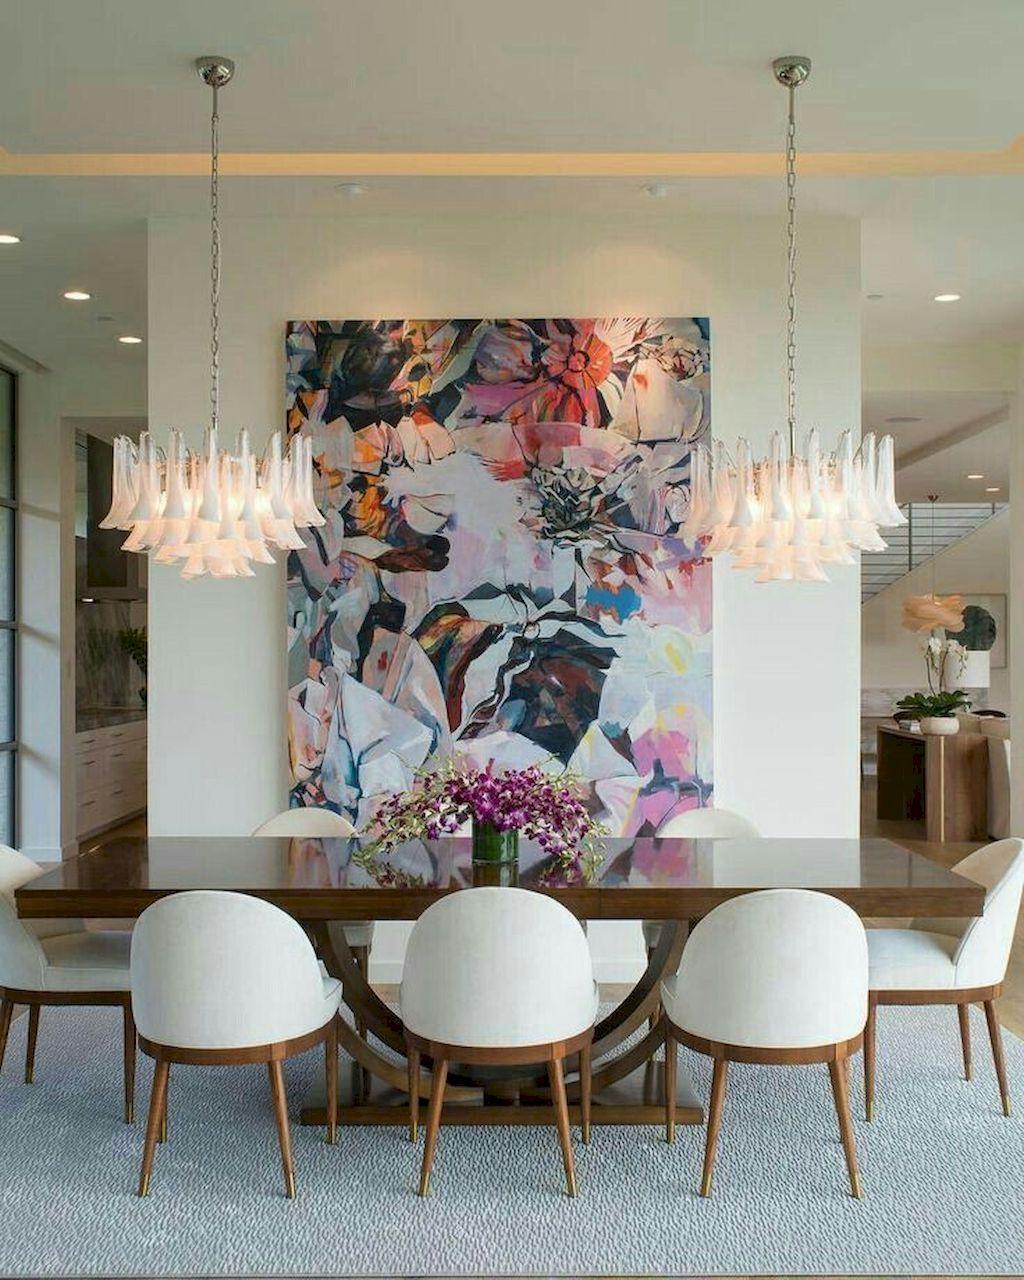 Mid Century Modern Dining Room Lighting: 60 Gorgeous Mid Century Modern Living Room Design Ideas